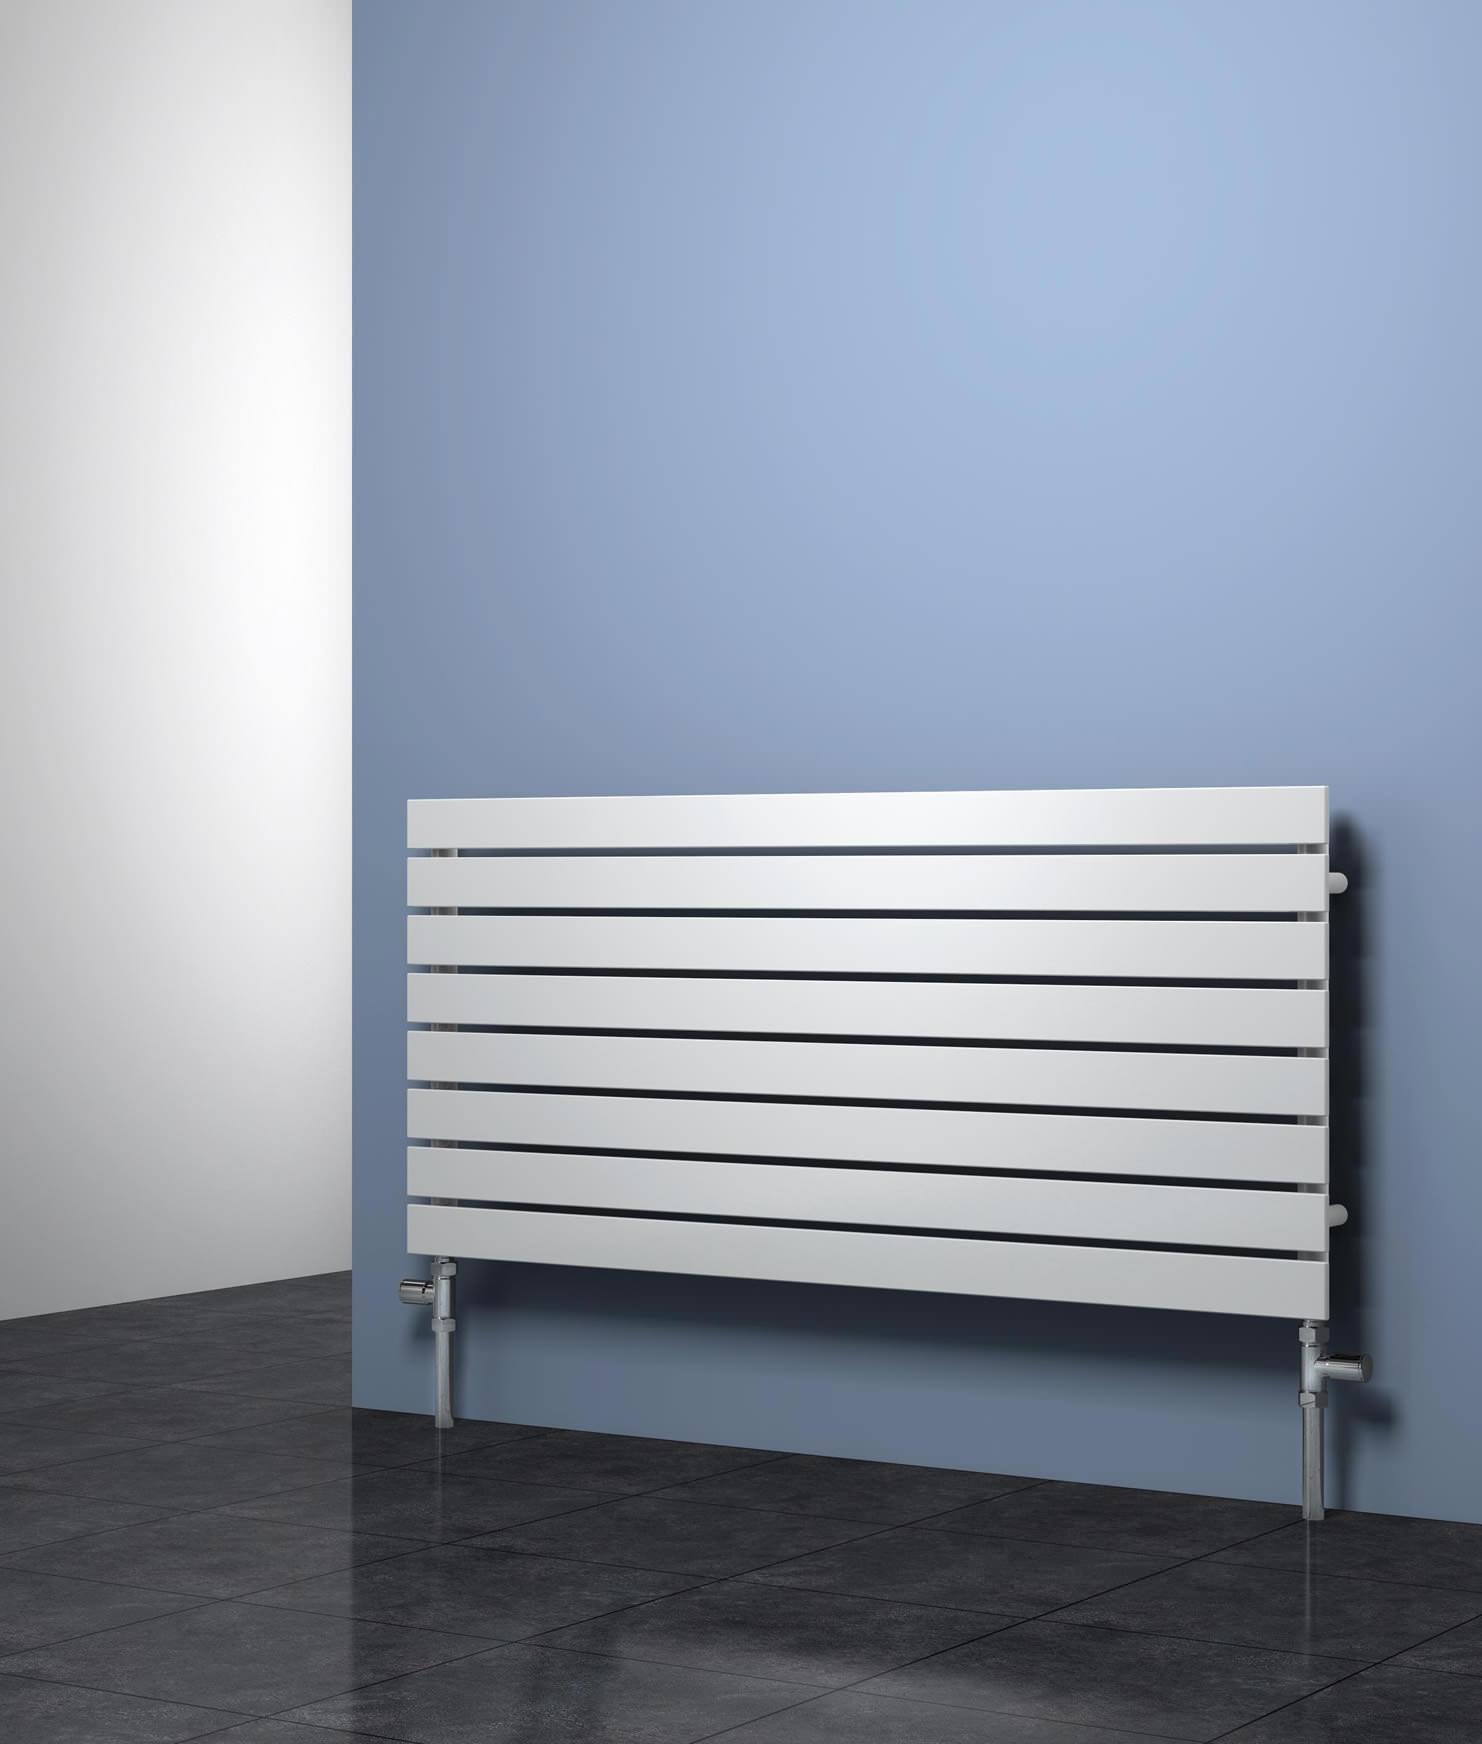 White Bathroom Radiators: Reina Rione Designer Radiator 800mm X 550mm White